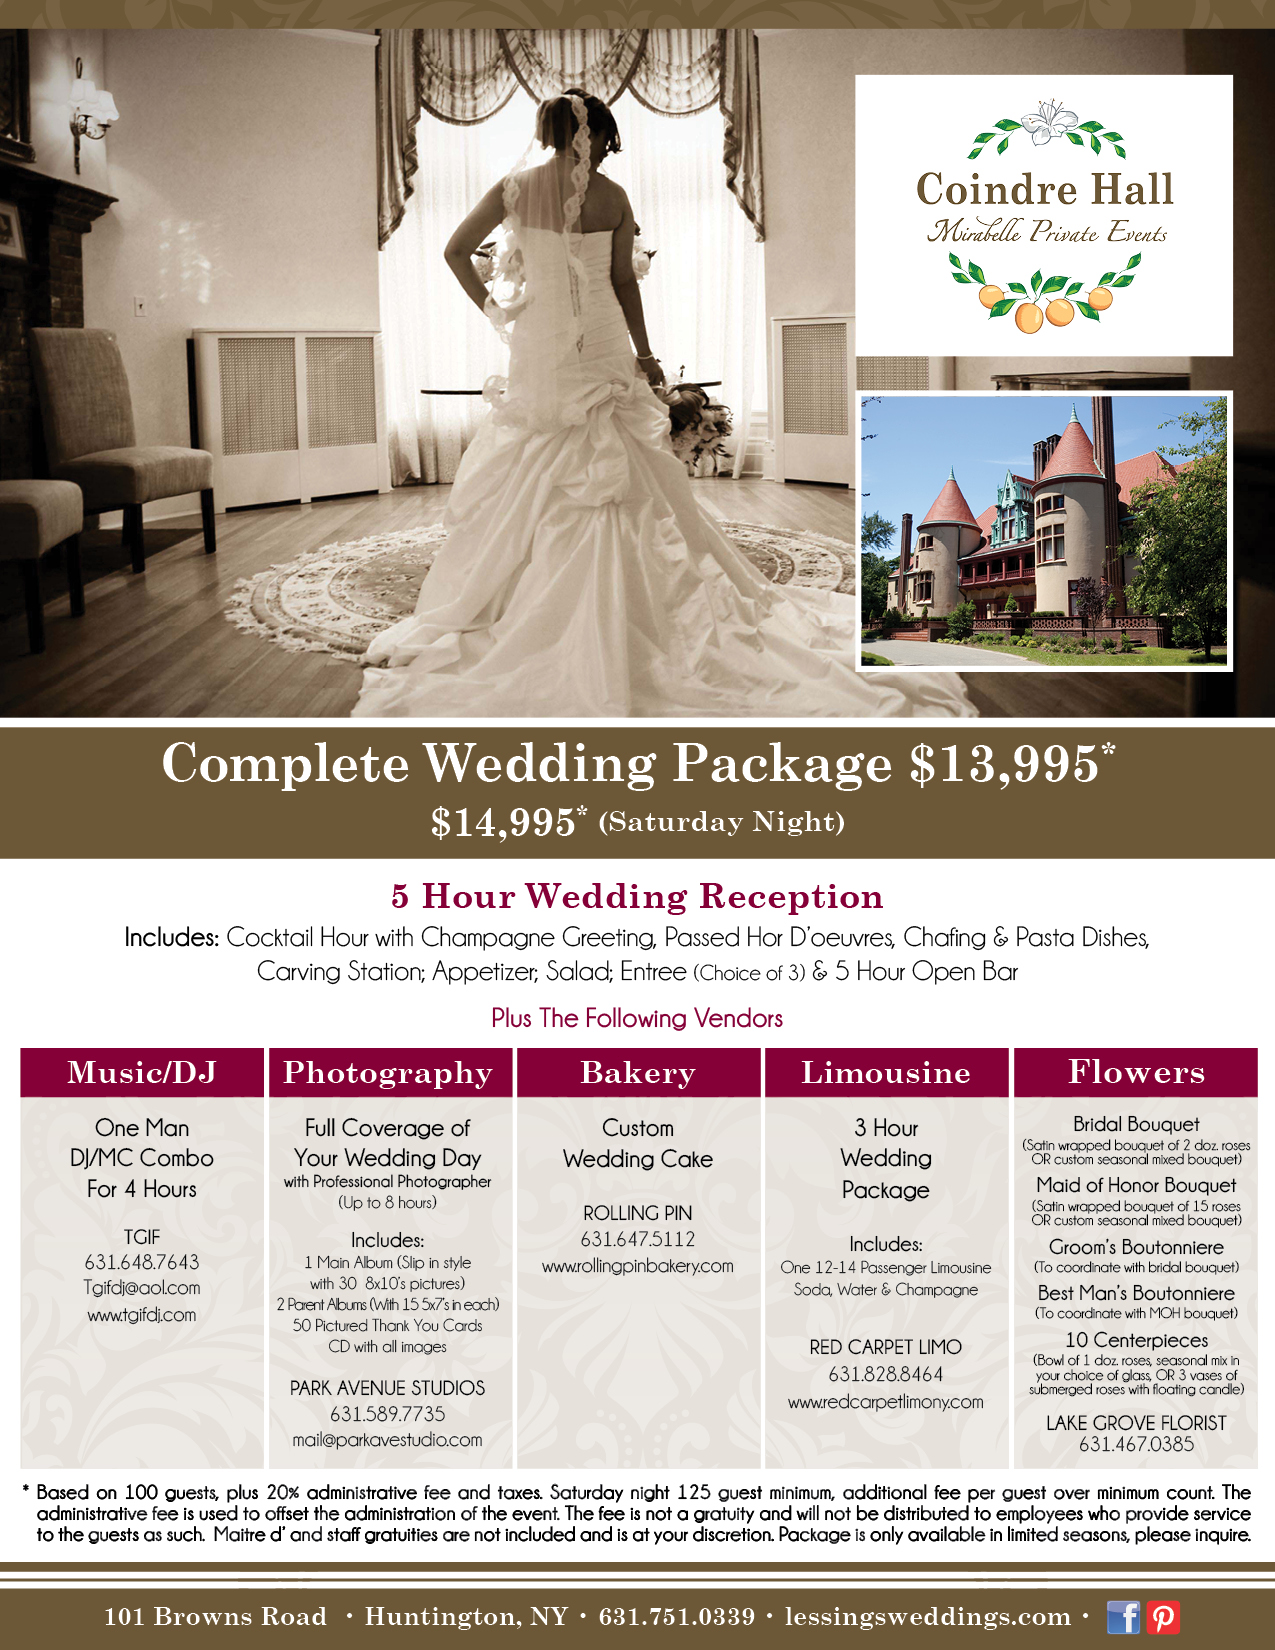 Off Season Complete Wedding Package